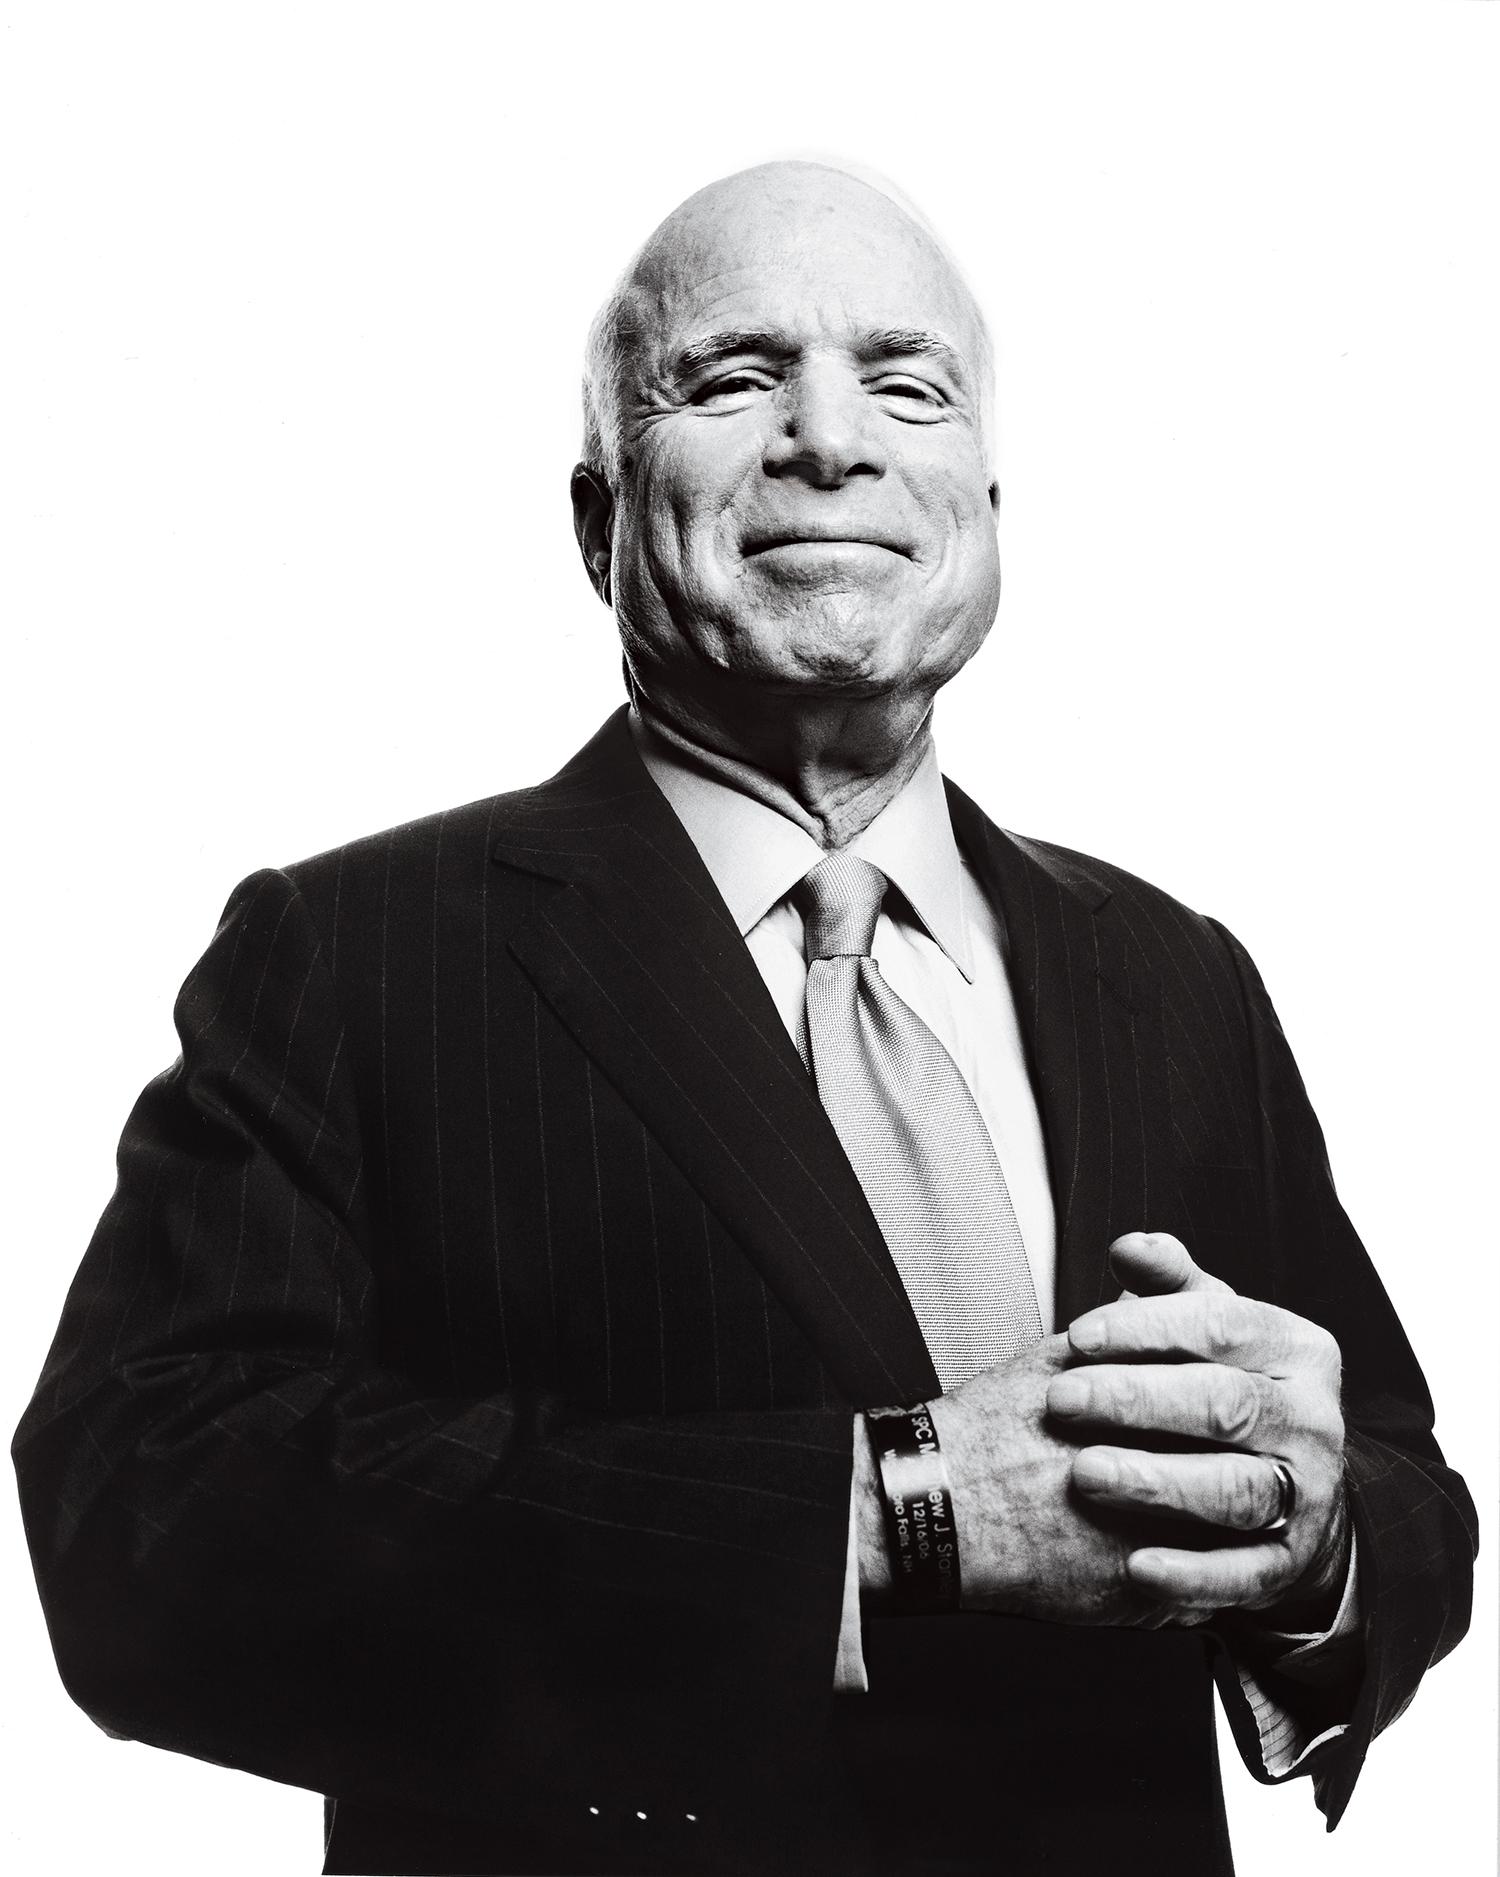 McCain_108-GQ-PO02.02 copy.jpg